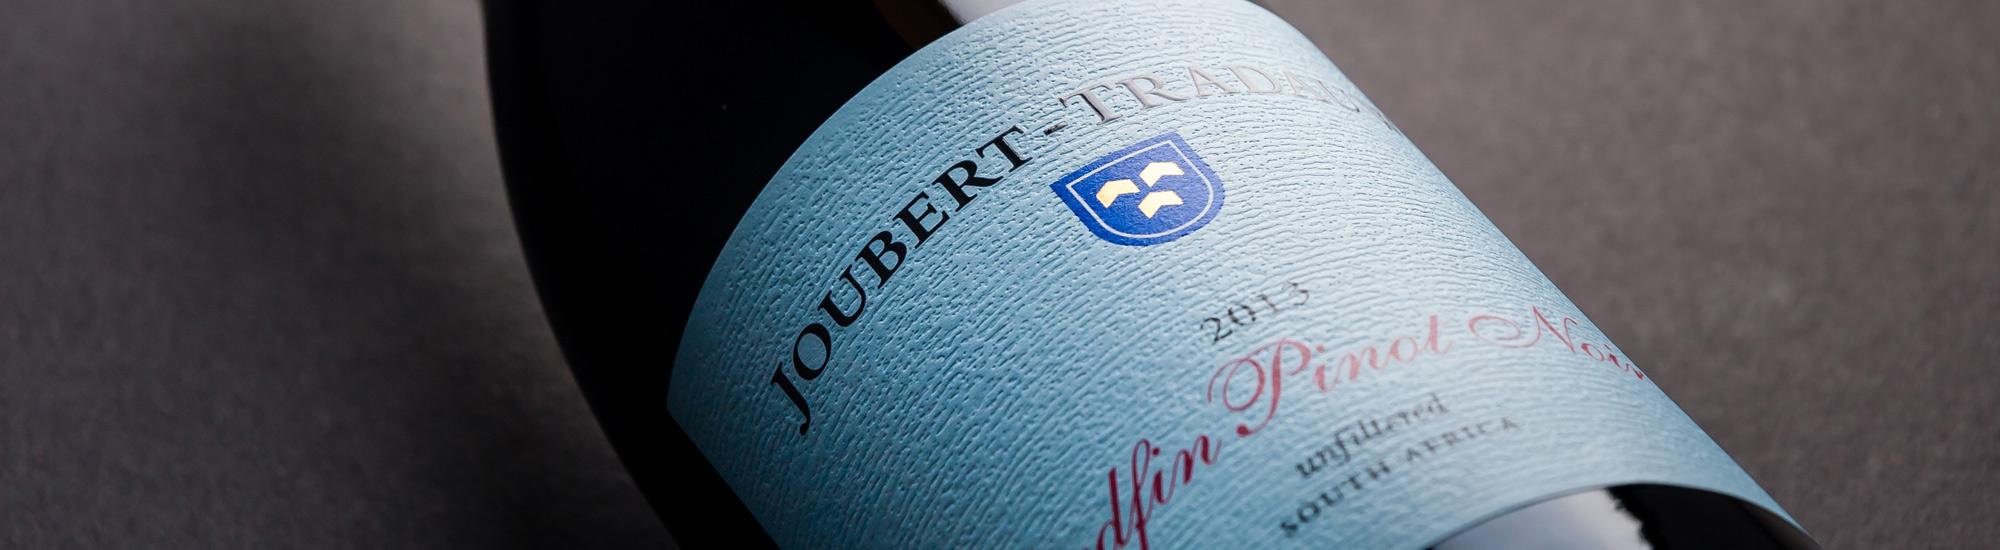 Wine Slider 005